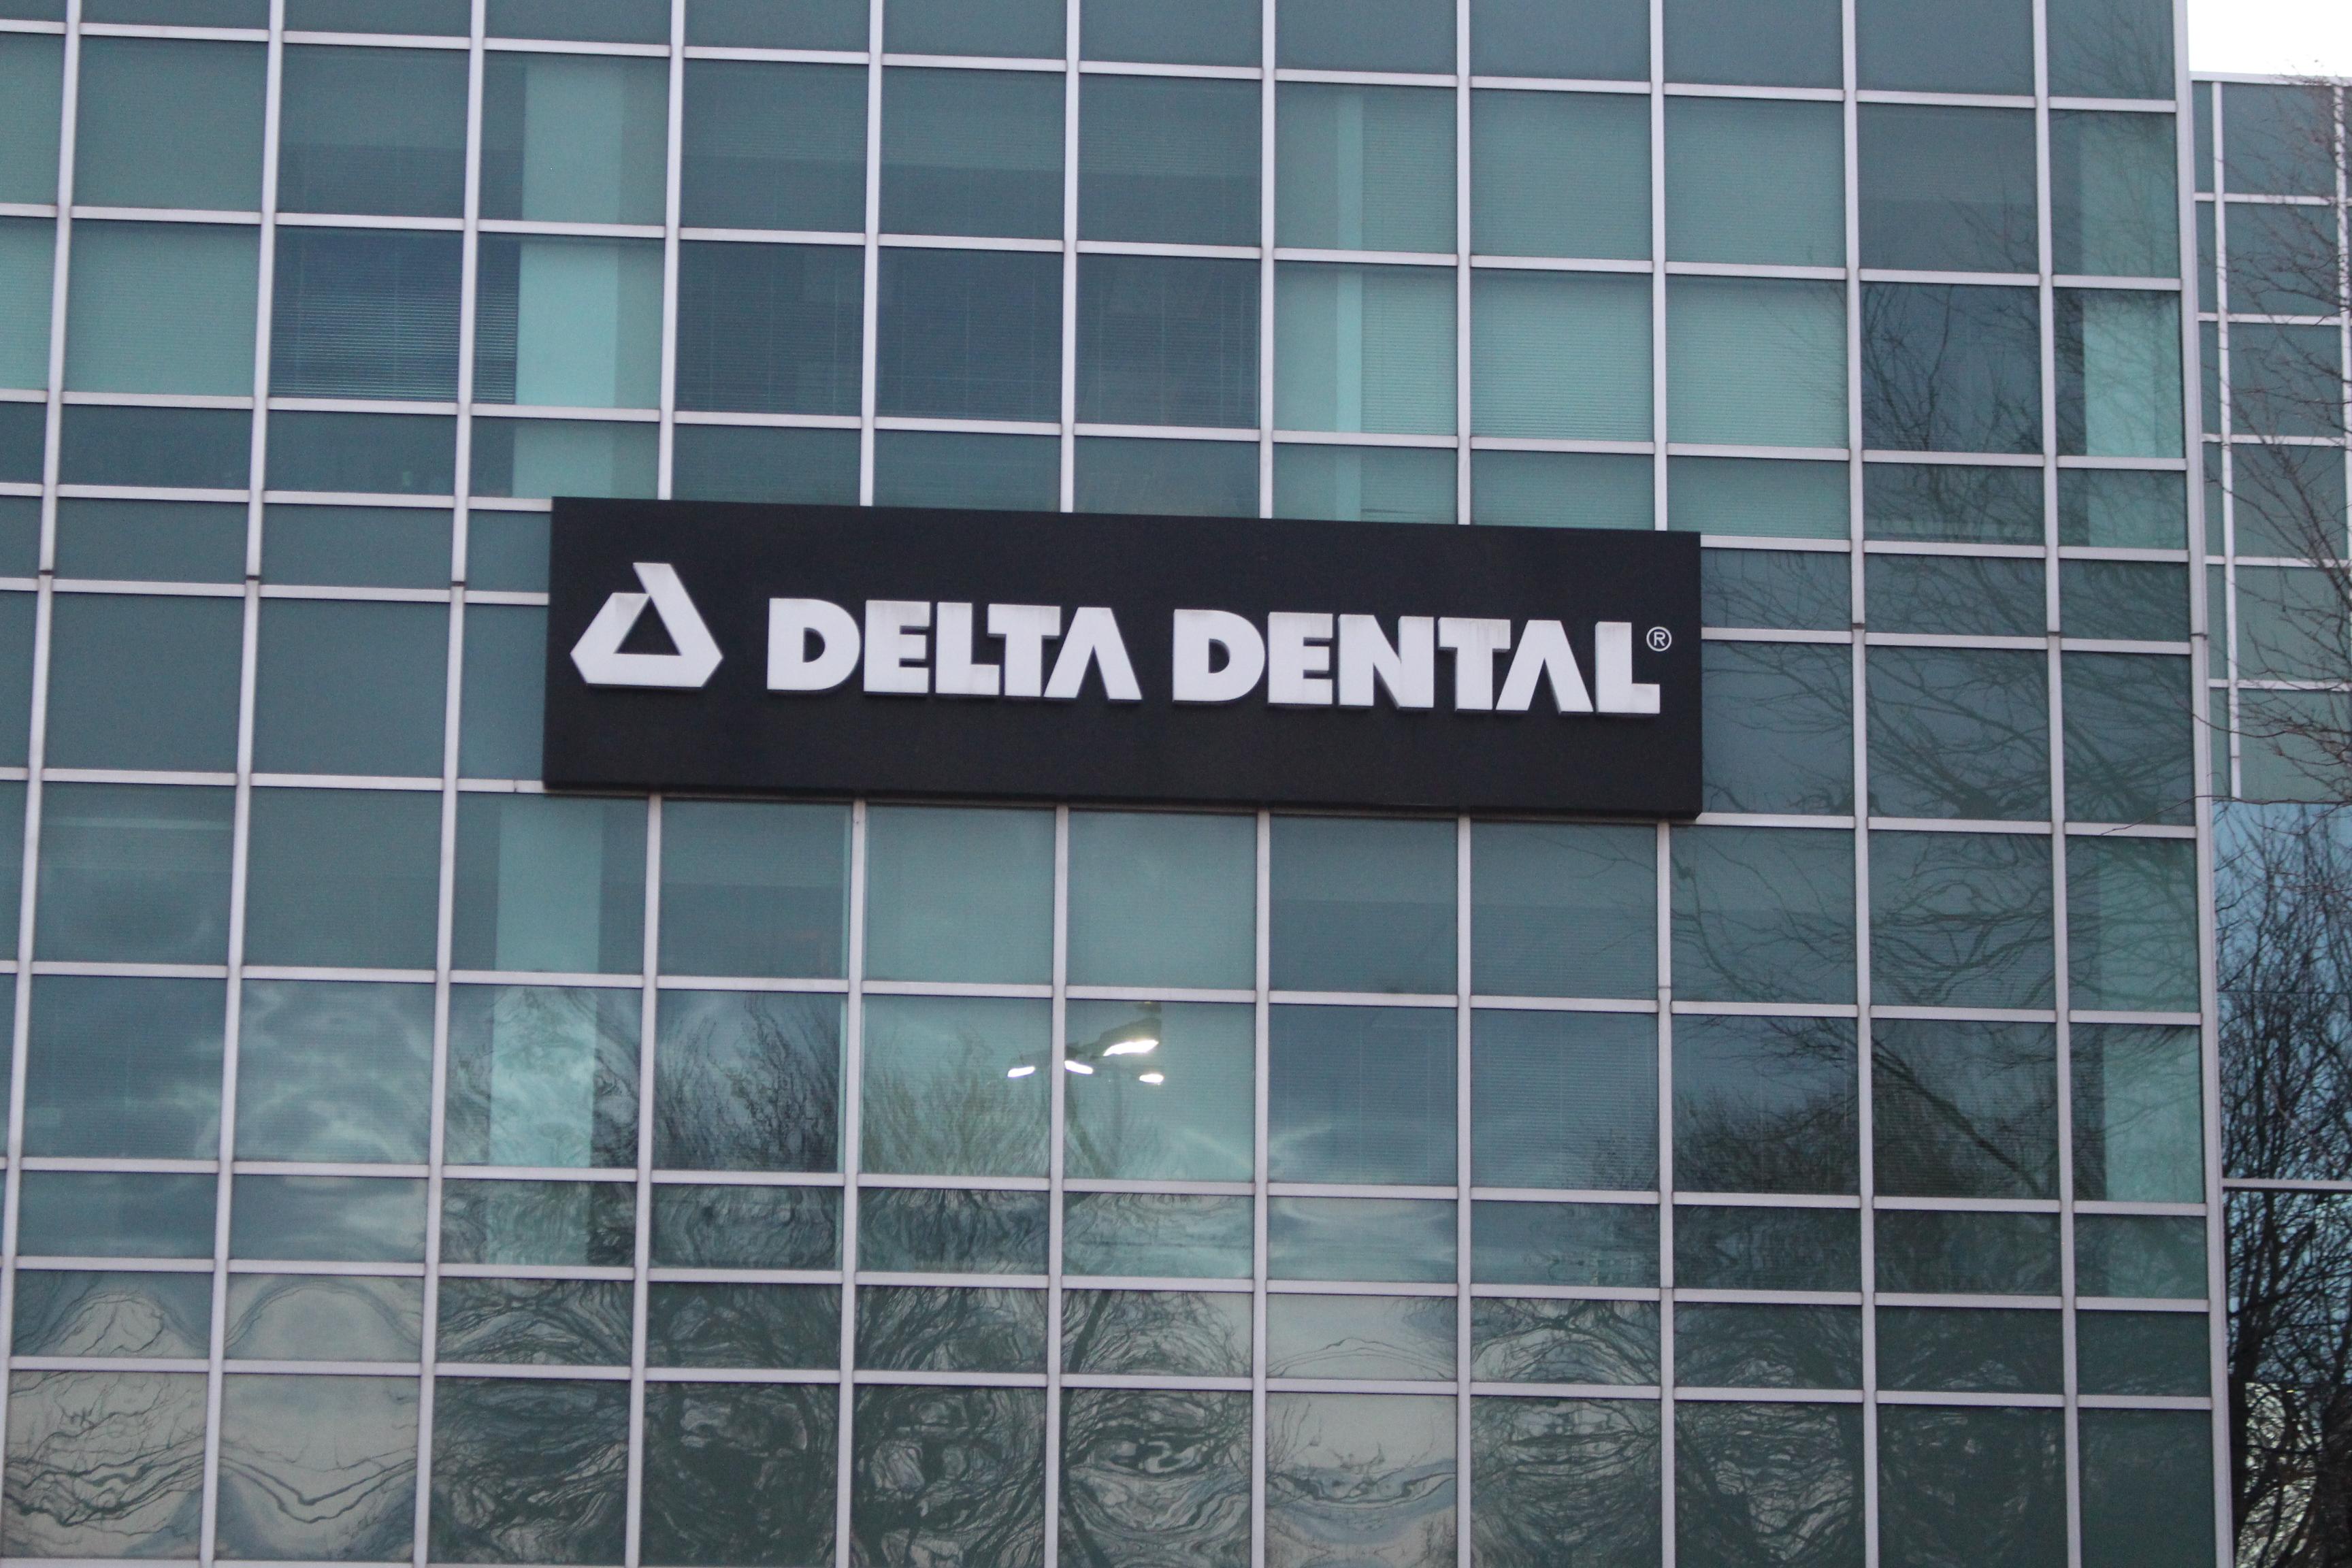 Delta Dental Awarded Grants to Non-Profits Dedicated to